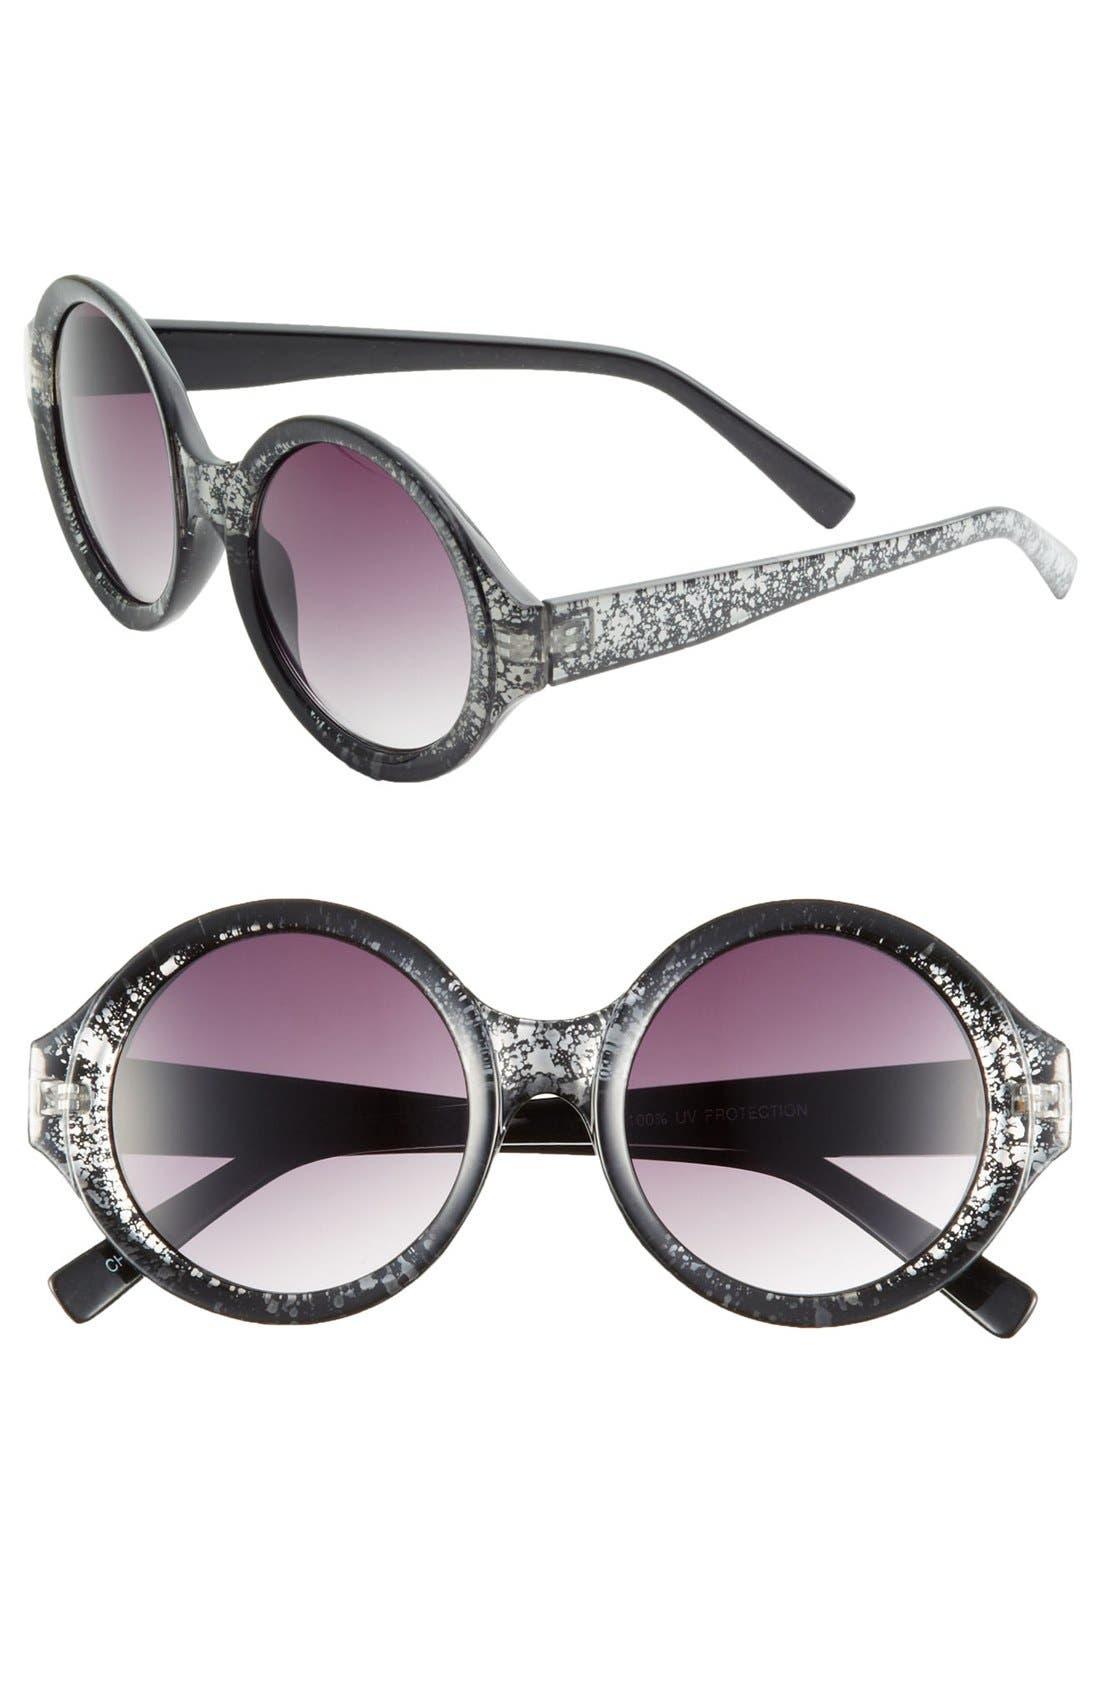 Main Image - FE NY 'Crackle' Circle Frame Sunglasses